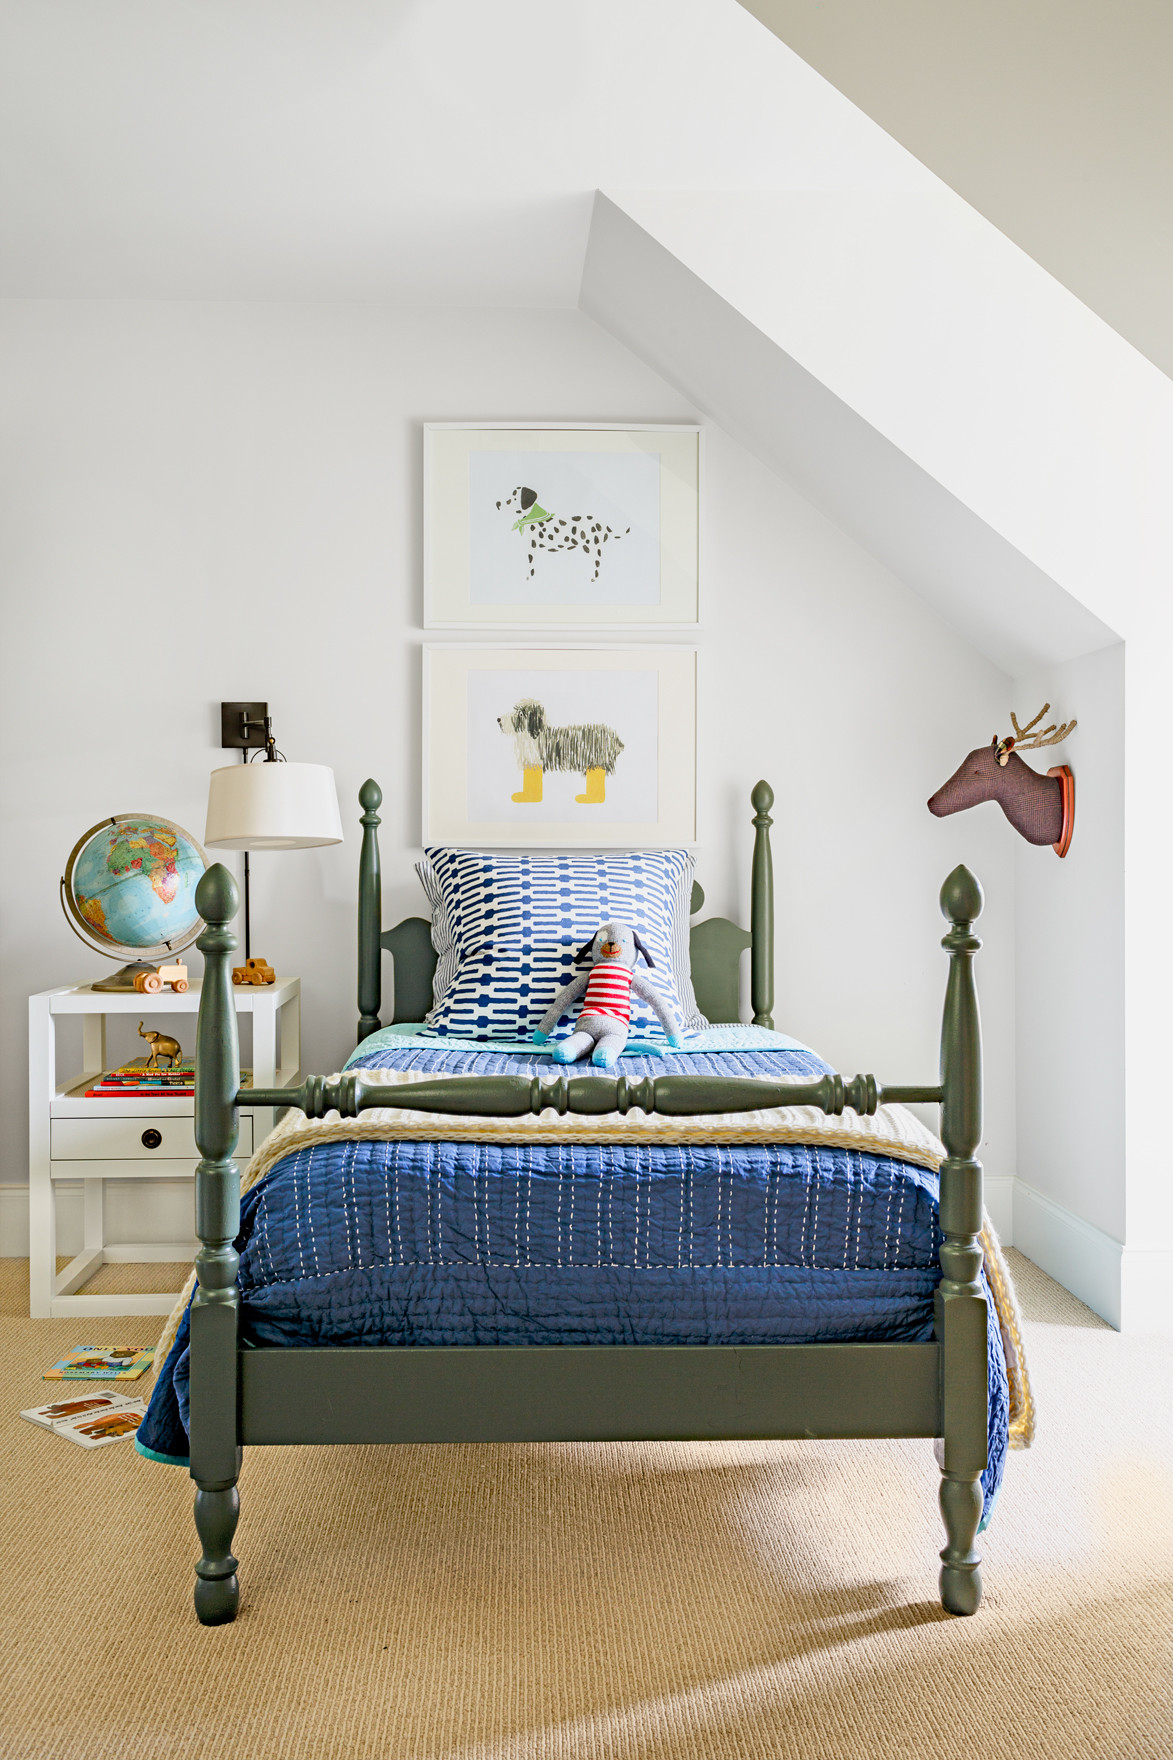 Boys Kids Room  50 Kids Room Decor Ideas – Bedroom Design and Decorating